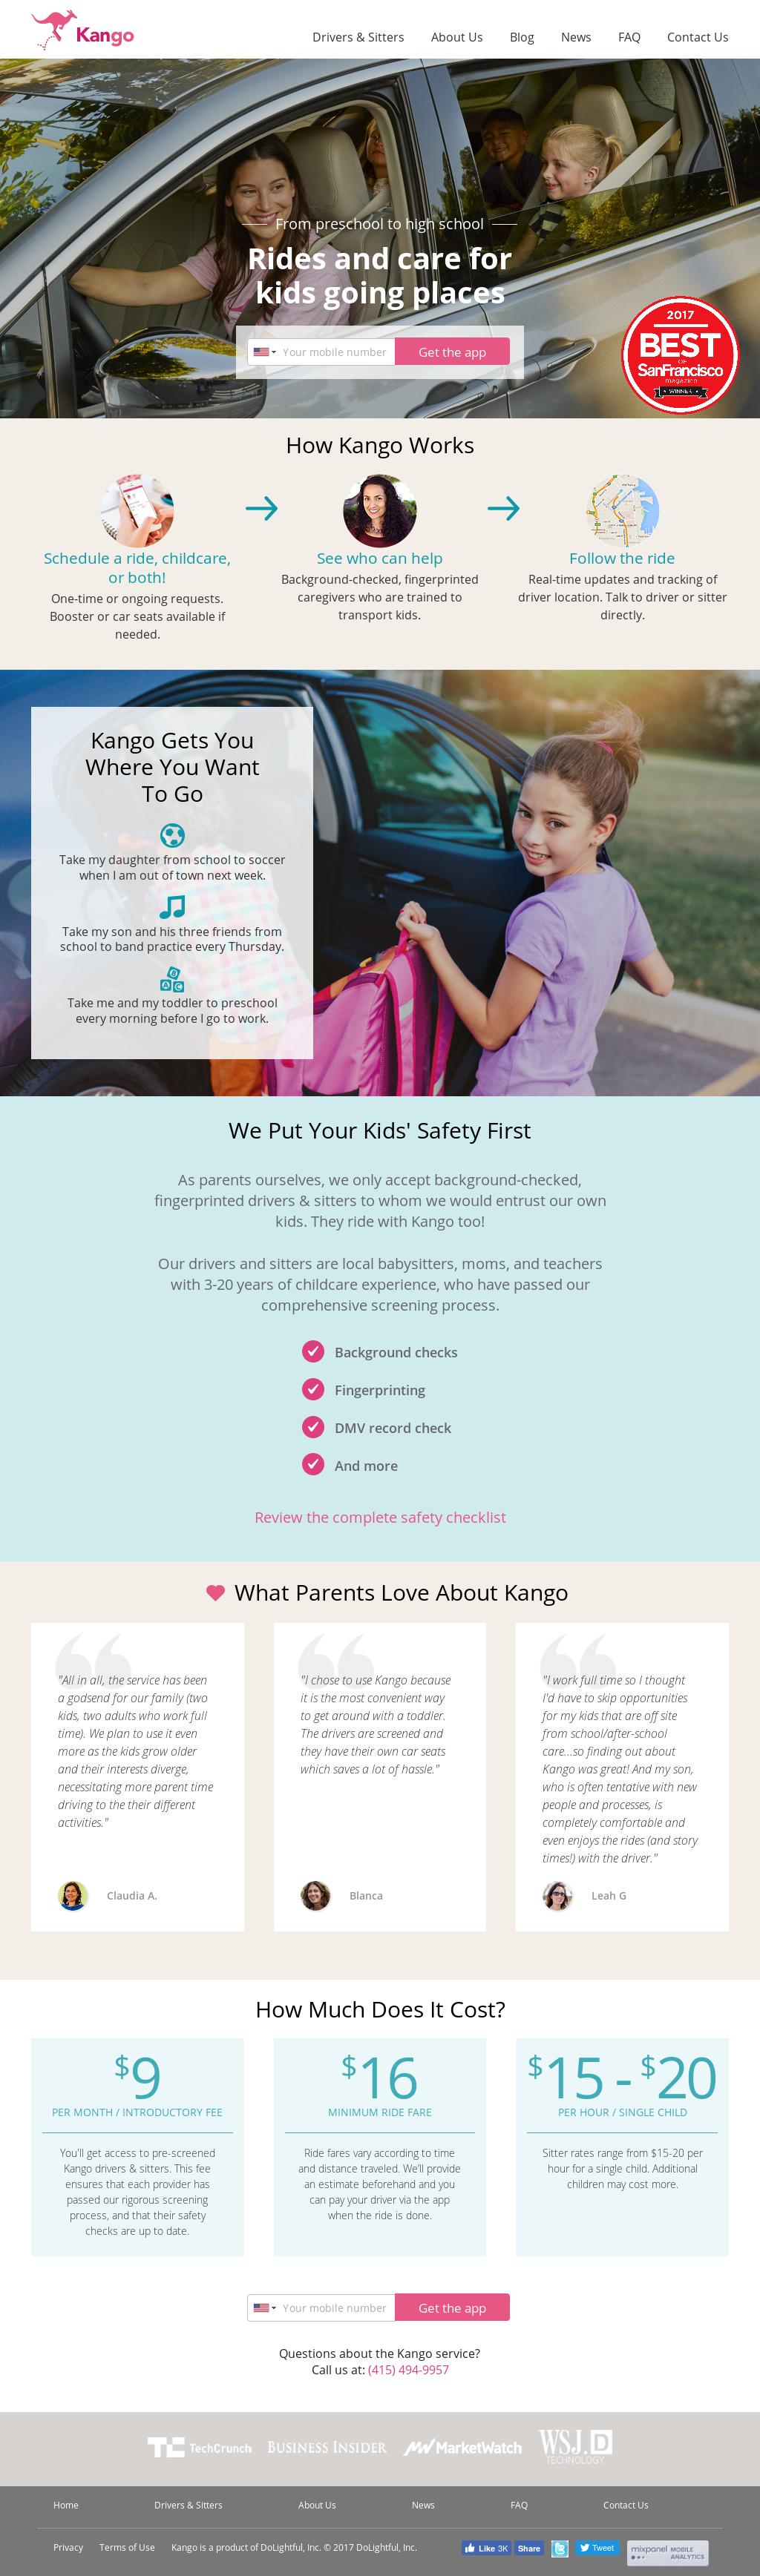 Kango Competitors, Revenue and Employees - Owler Company Profile